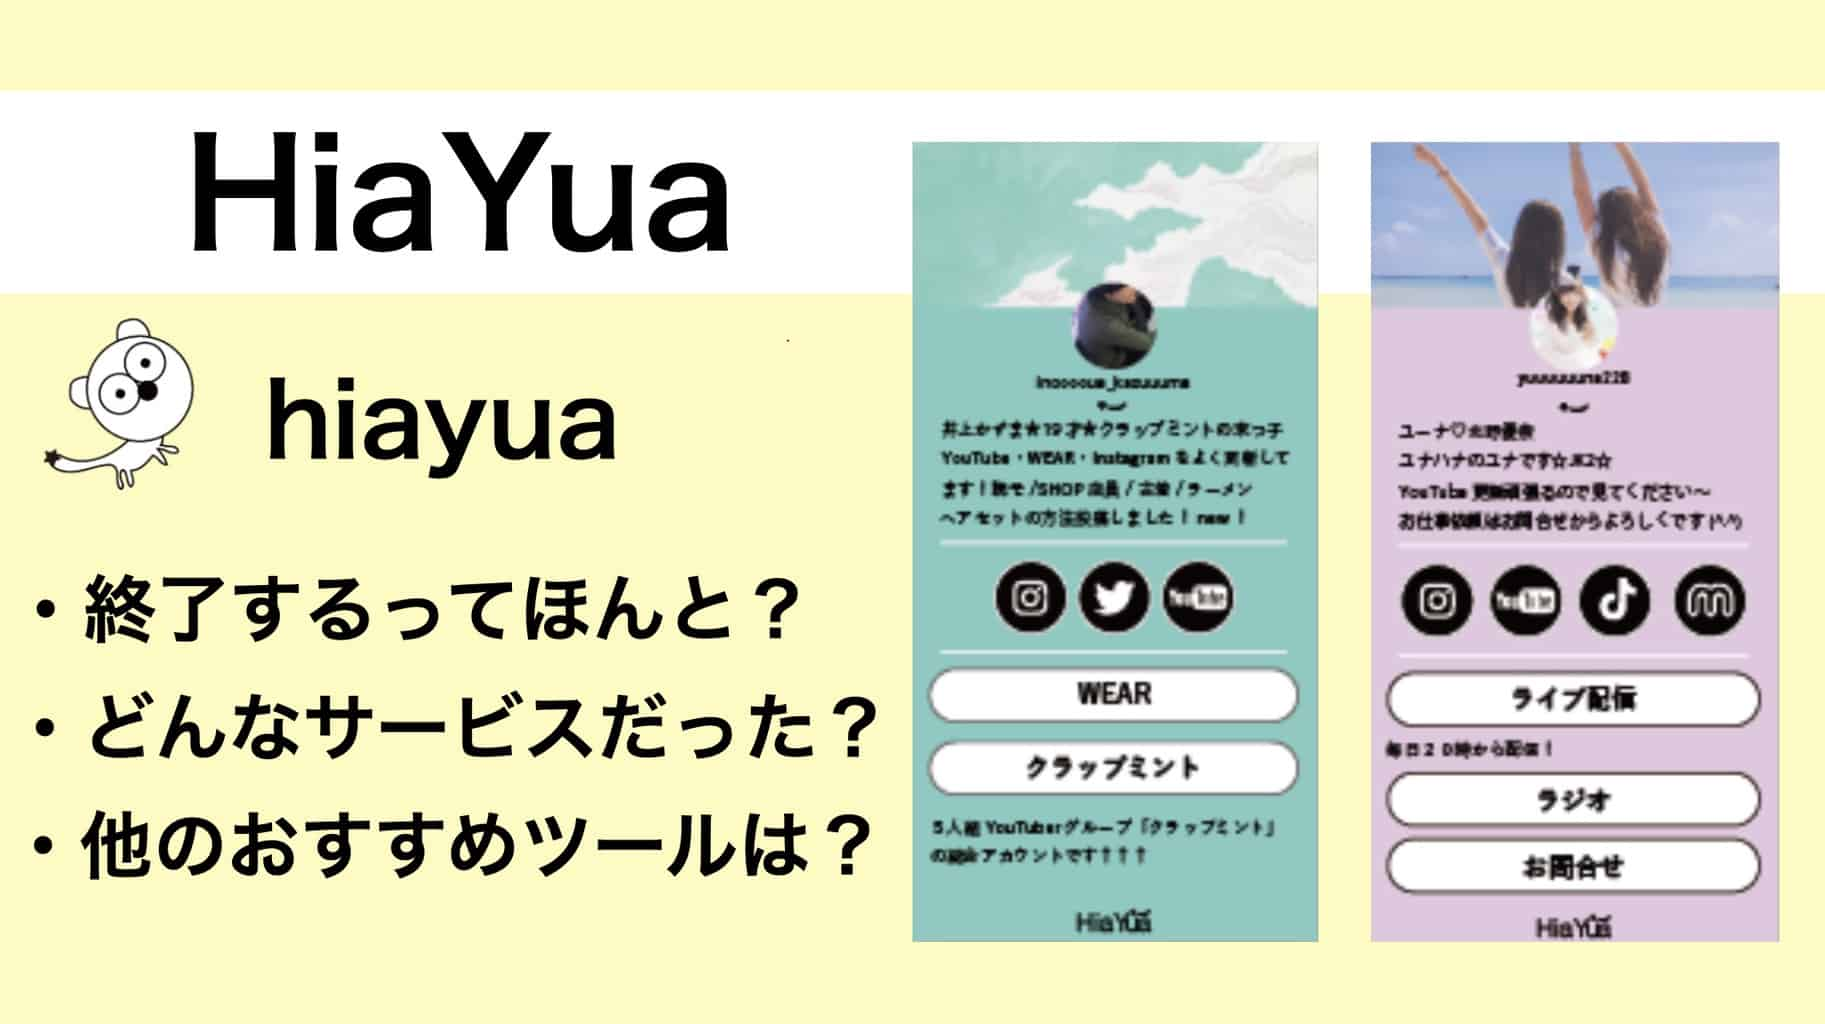 hiayua